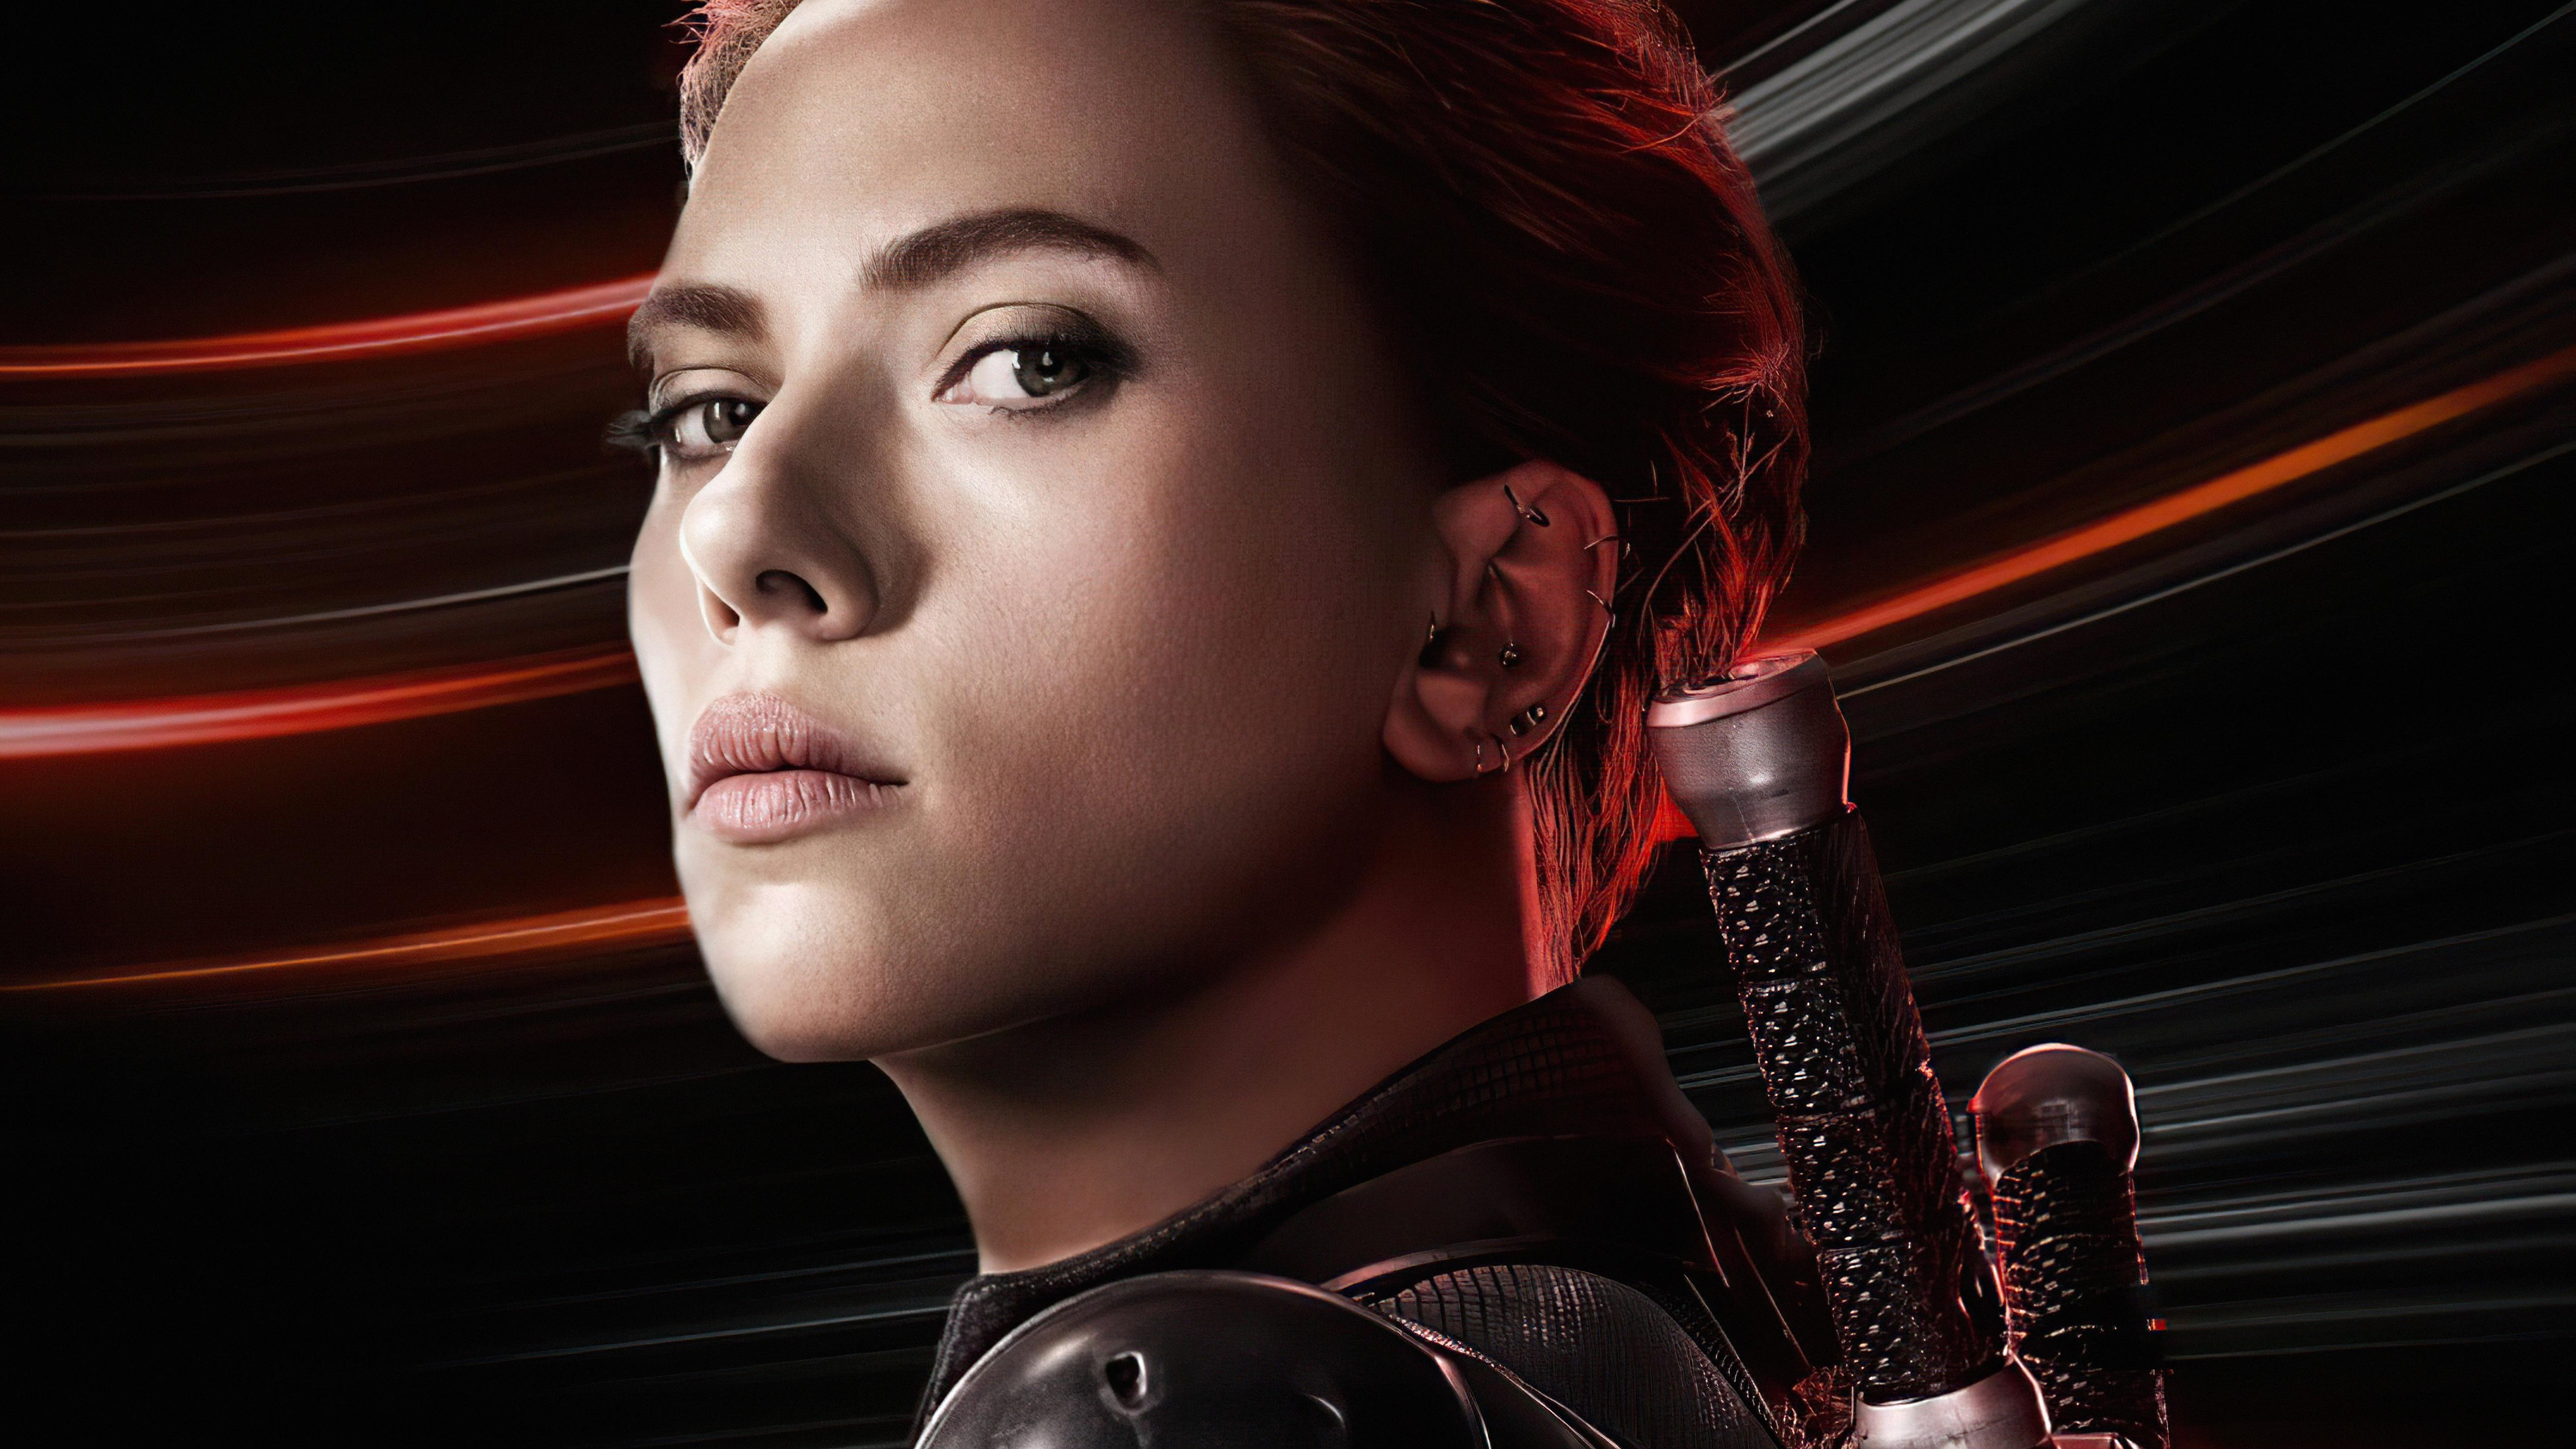 Fondos de pantalla Scarlett Johanson Viuda Negra 2021 Película